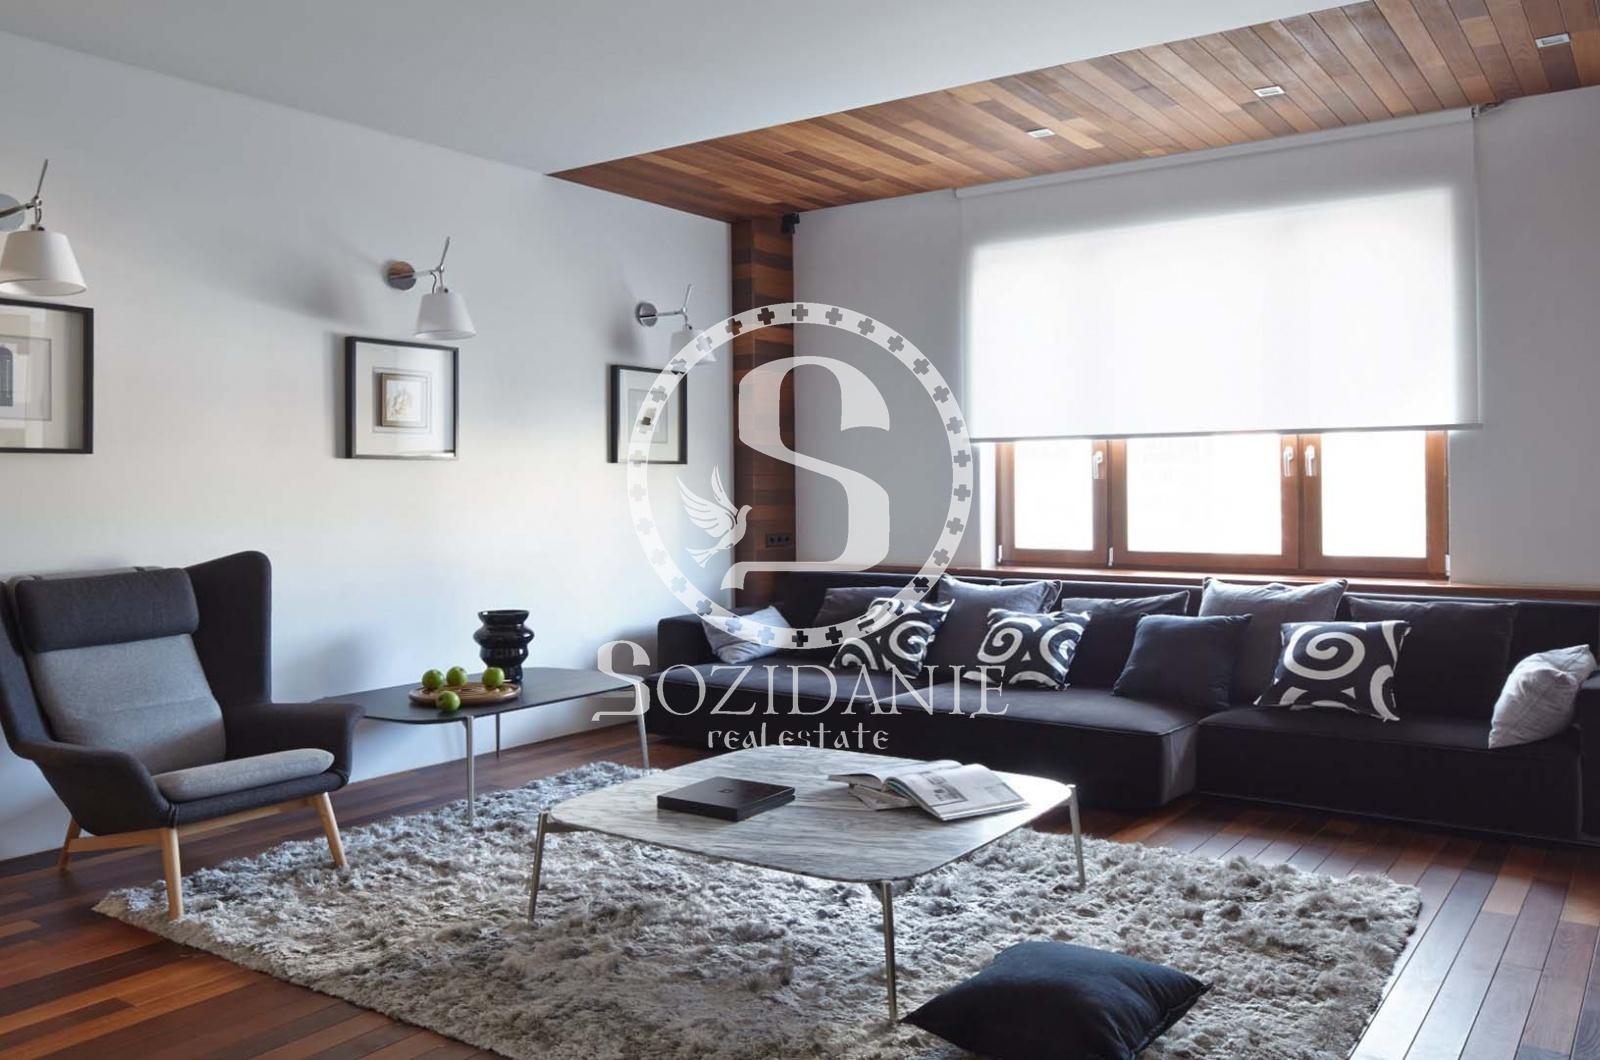 5 Комнаты, Городская, Продажа, Улица Столетова, Listing ID 3675, Москва, Россия,